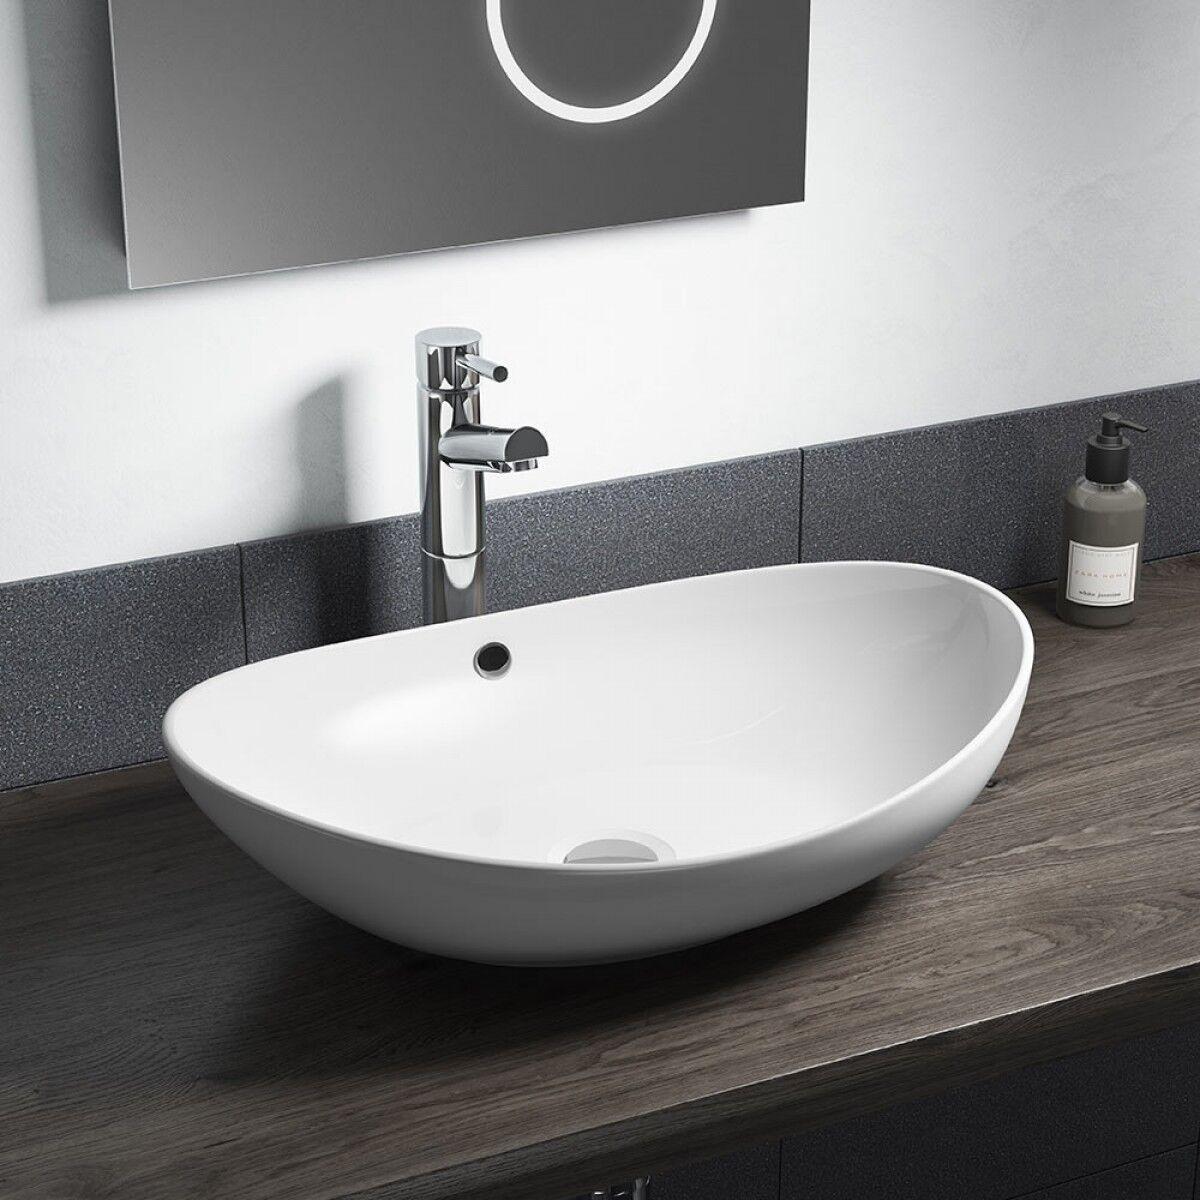 bathroom white oval basin sink bowl